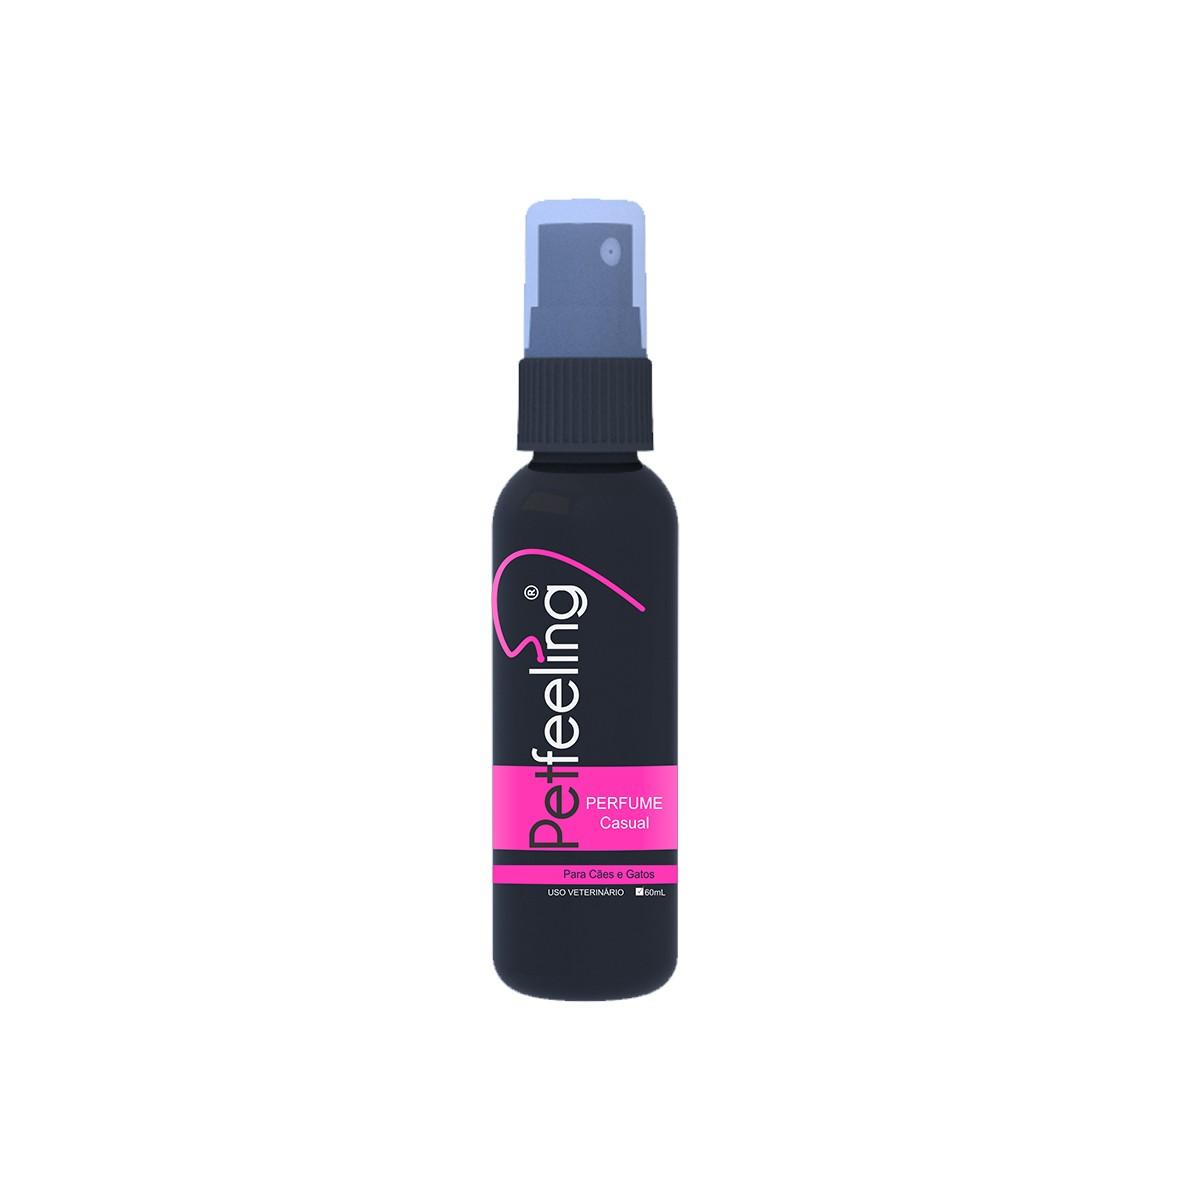 Perfume Casual 60ml Petfeeling